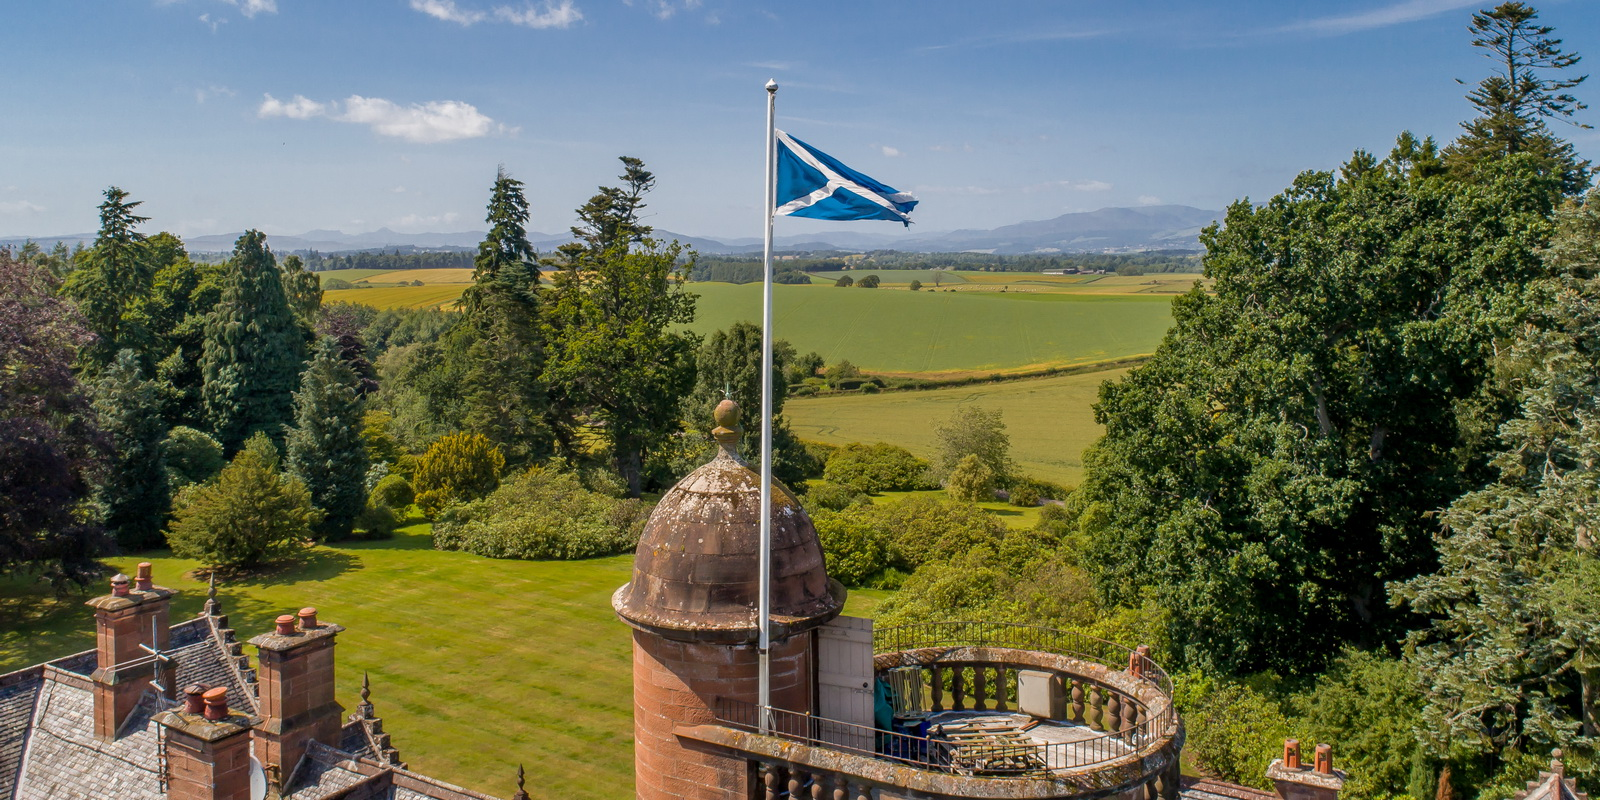 Auchterarder House with Scottish flag